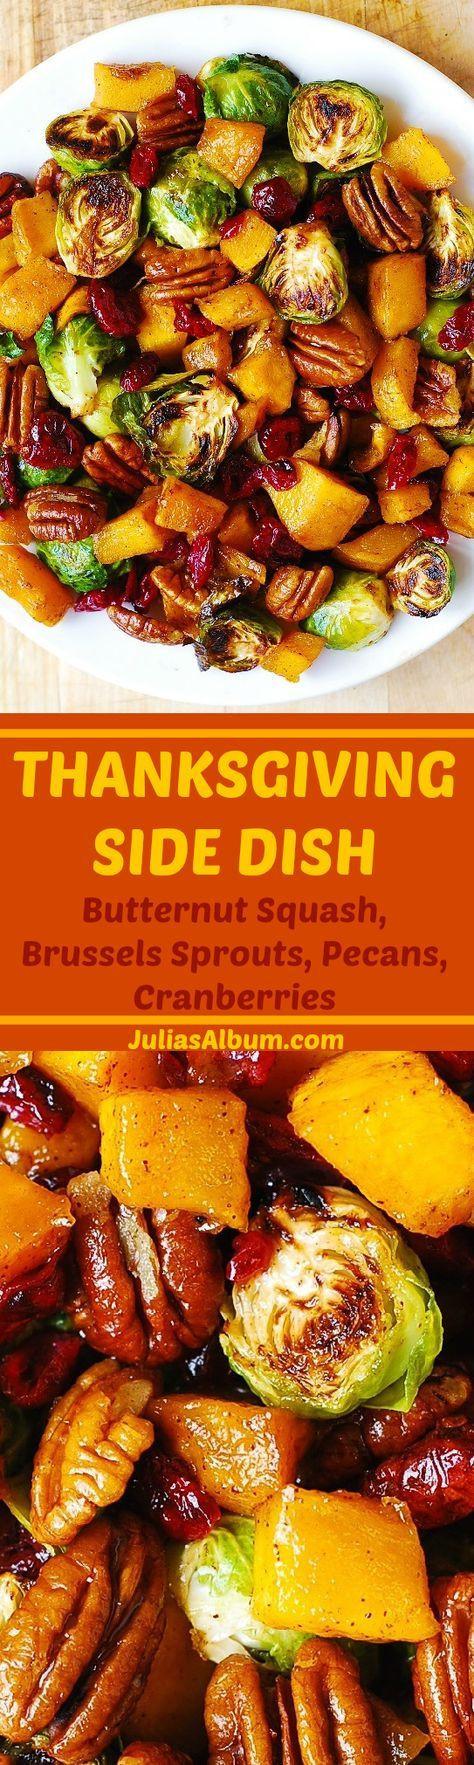 Thanksgiving Vegetarian Dish  Best 25 Thanksgiving recipes ideas on Pinterest